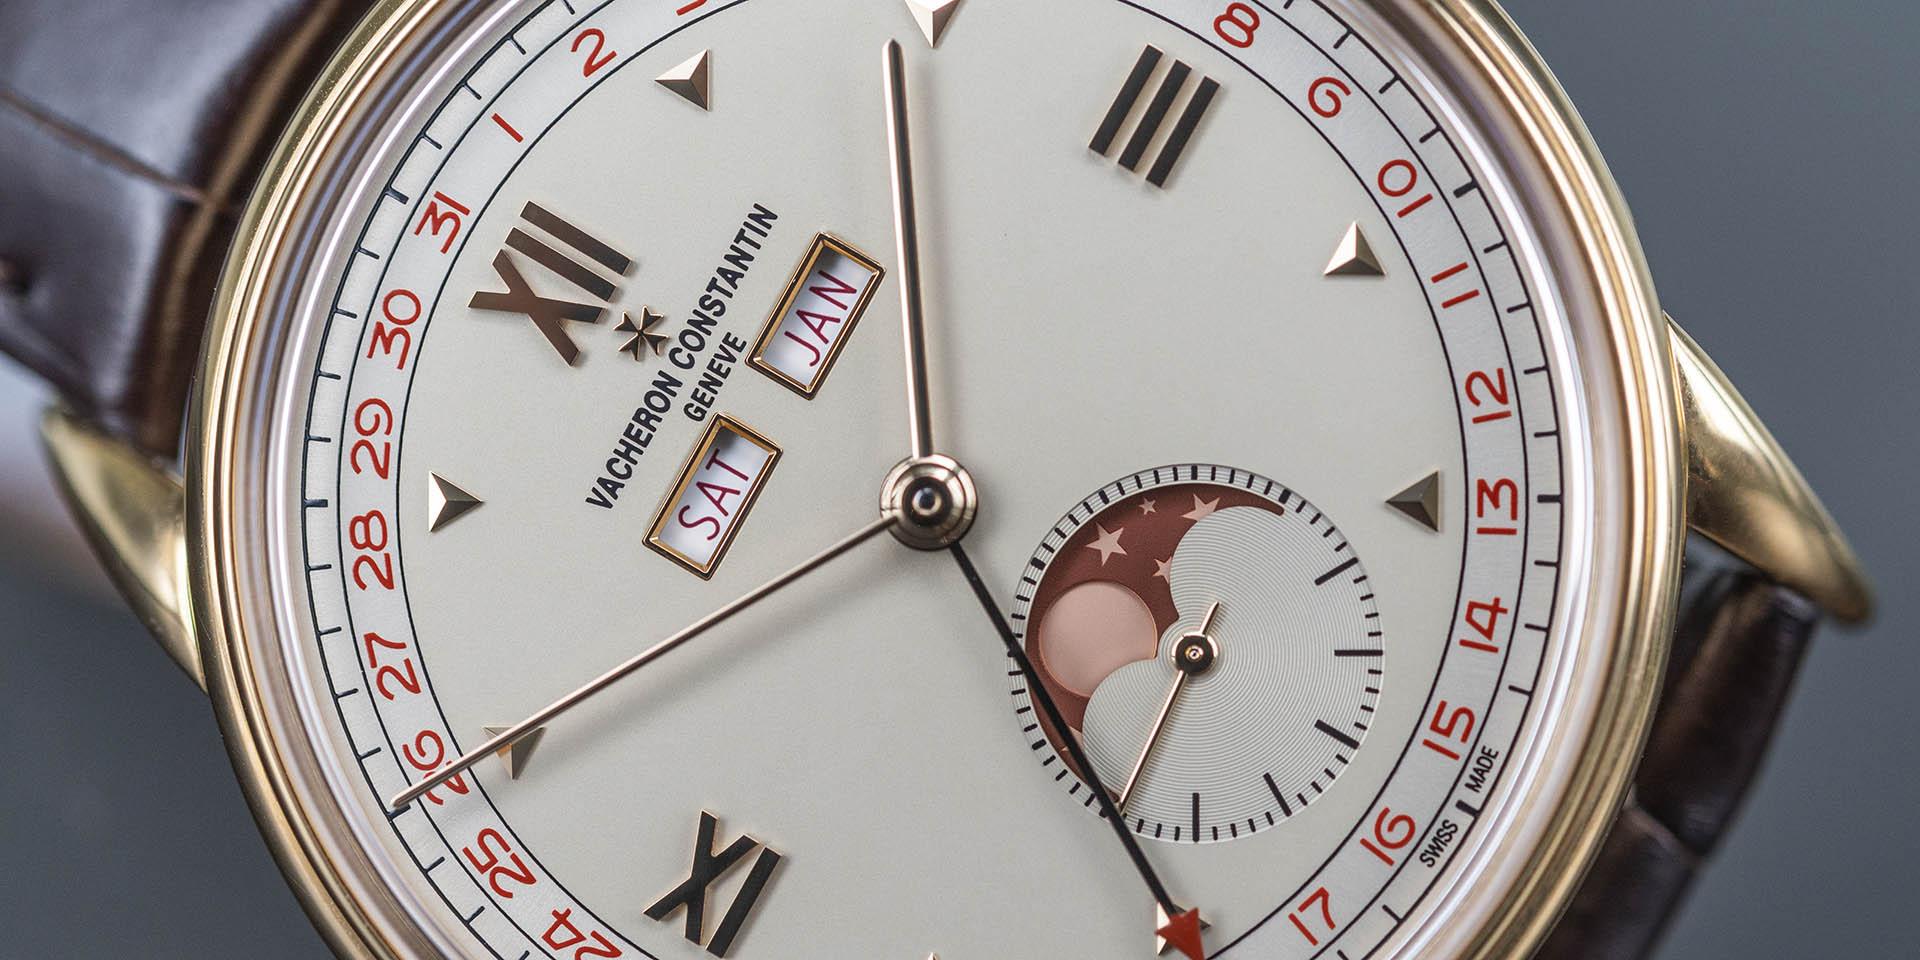 3100v-000r-b359-vacheron-constantin-historiques-triple-calendar-1948-1.jpg